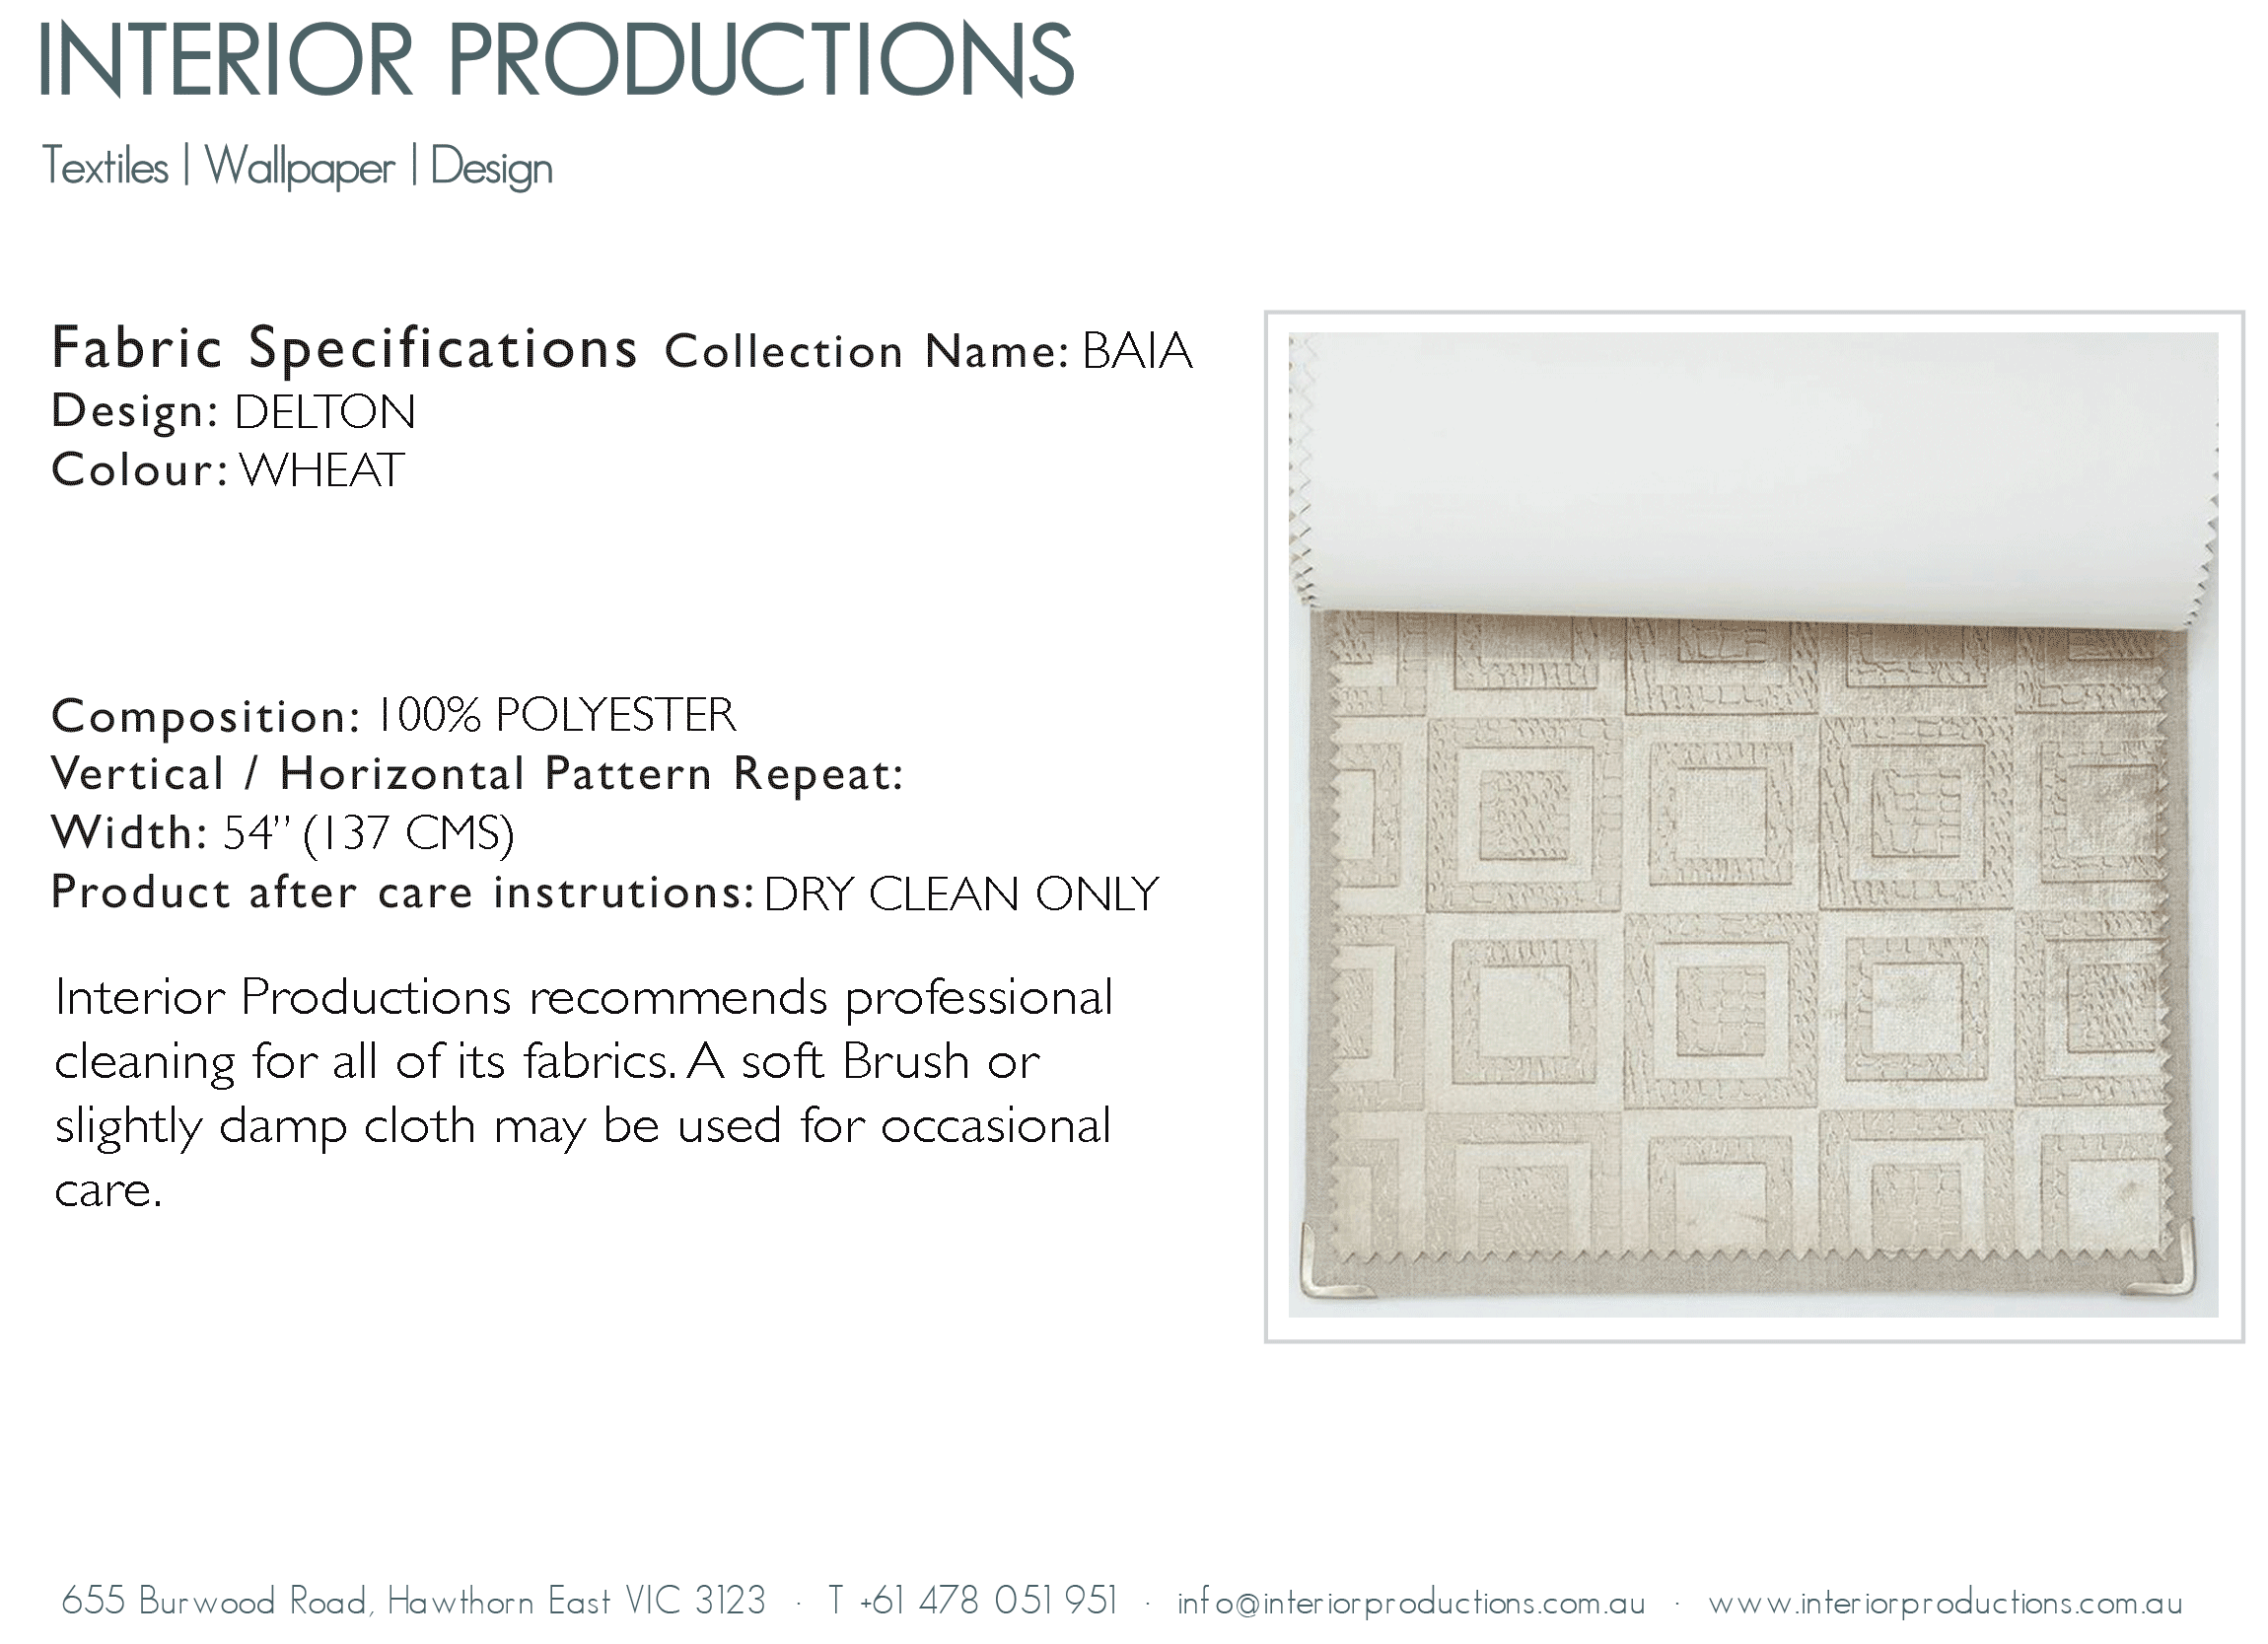 interior_productions_DELTON---WHEAT